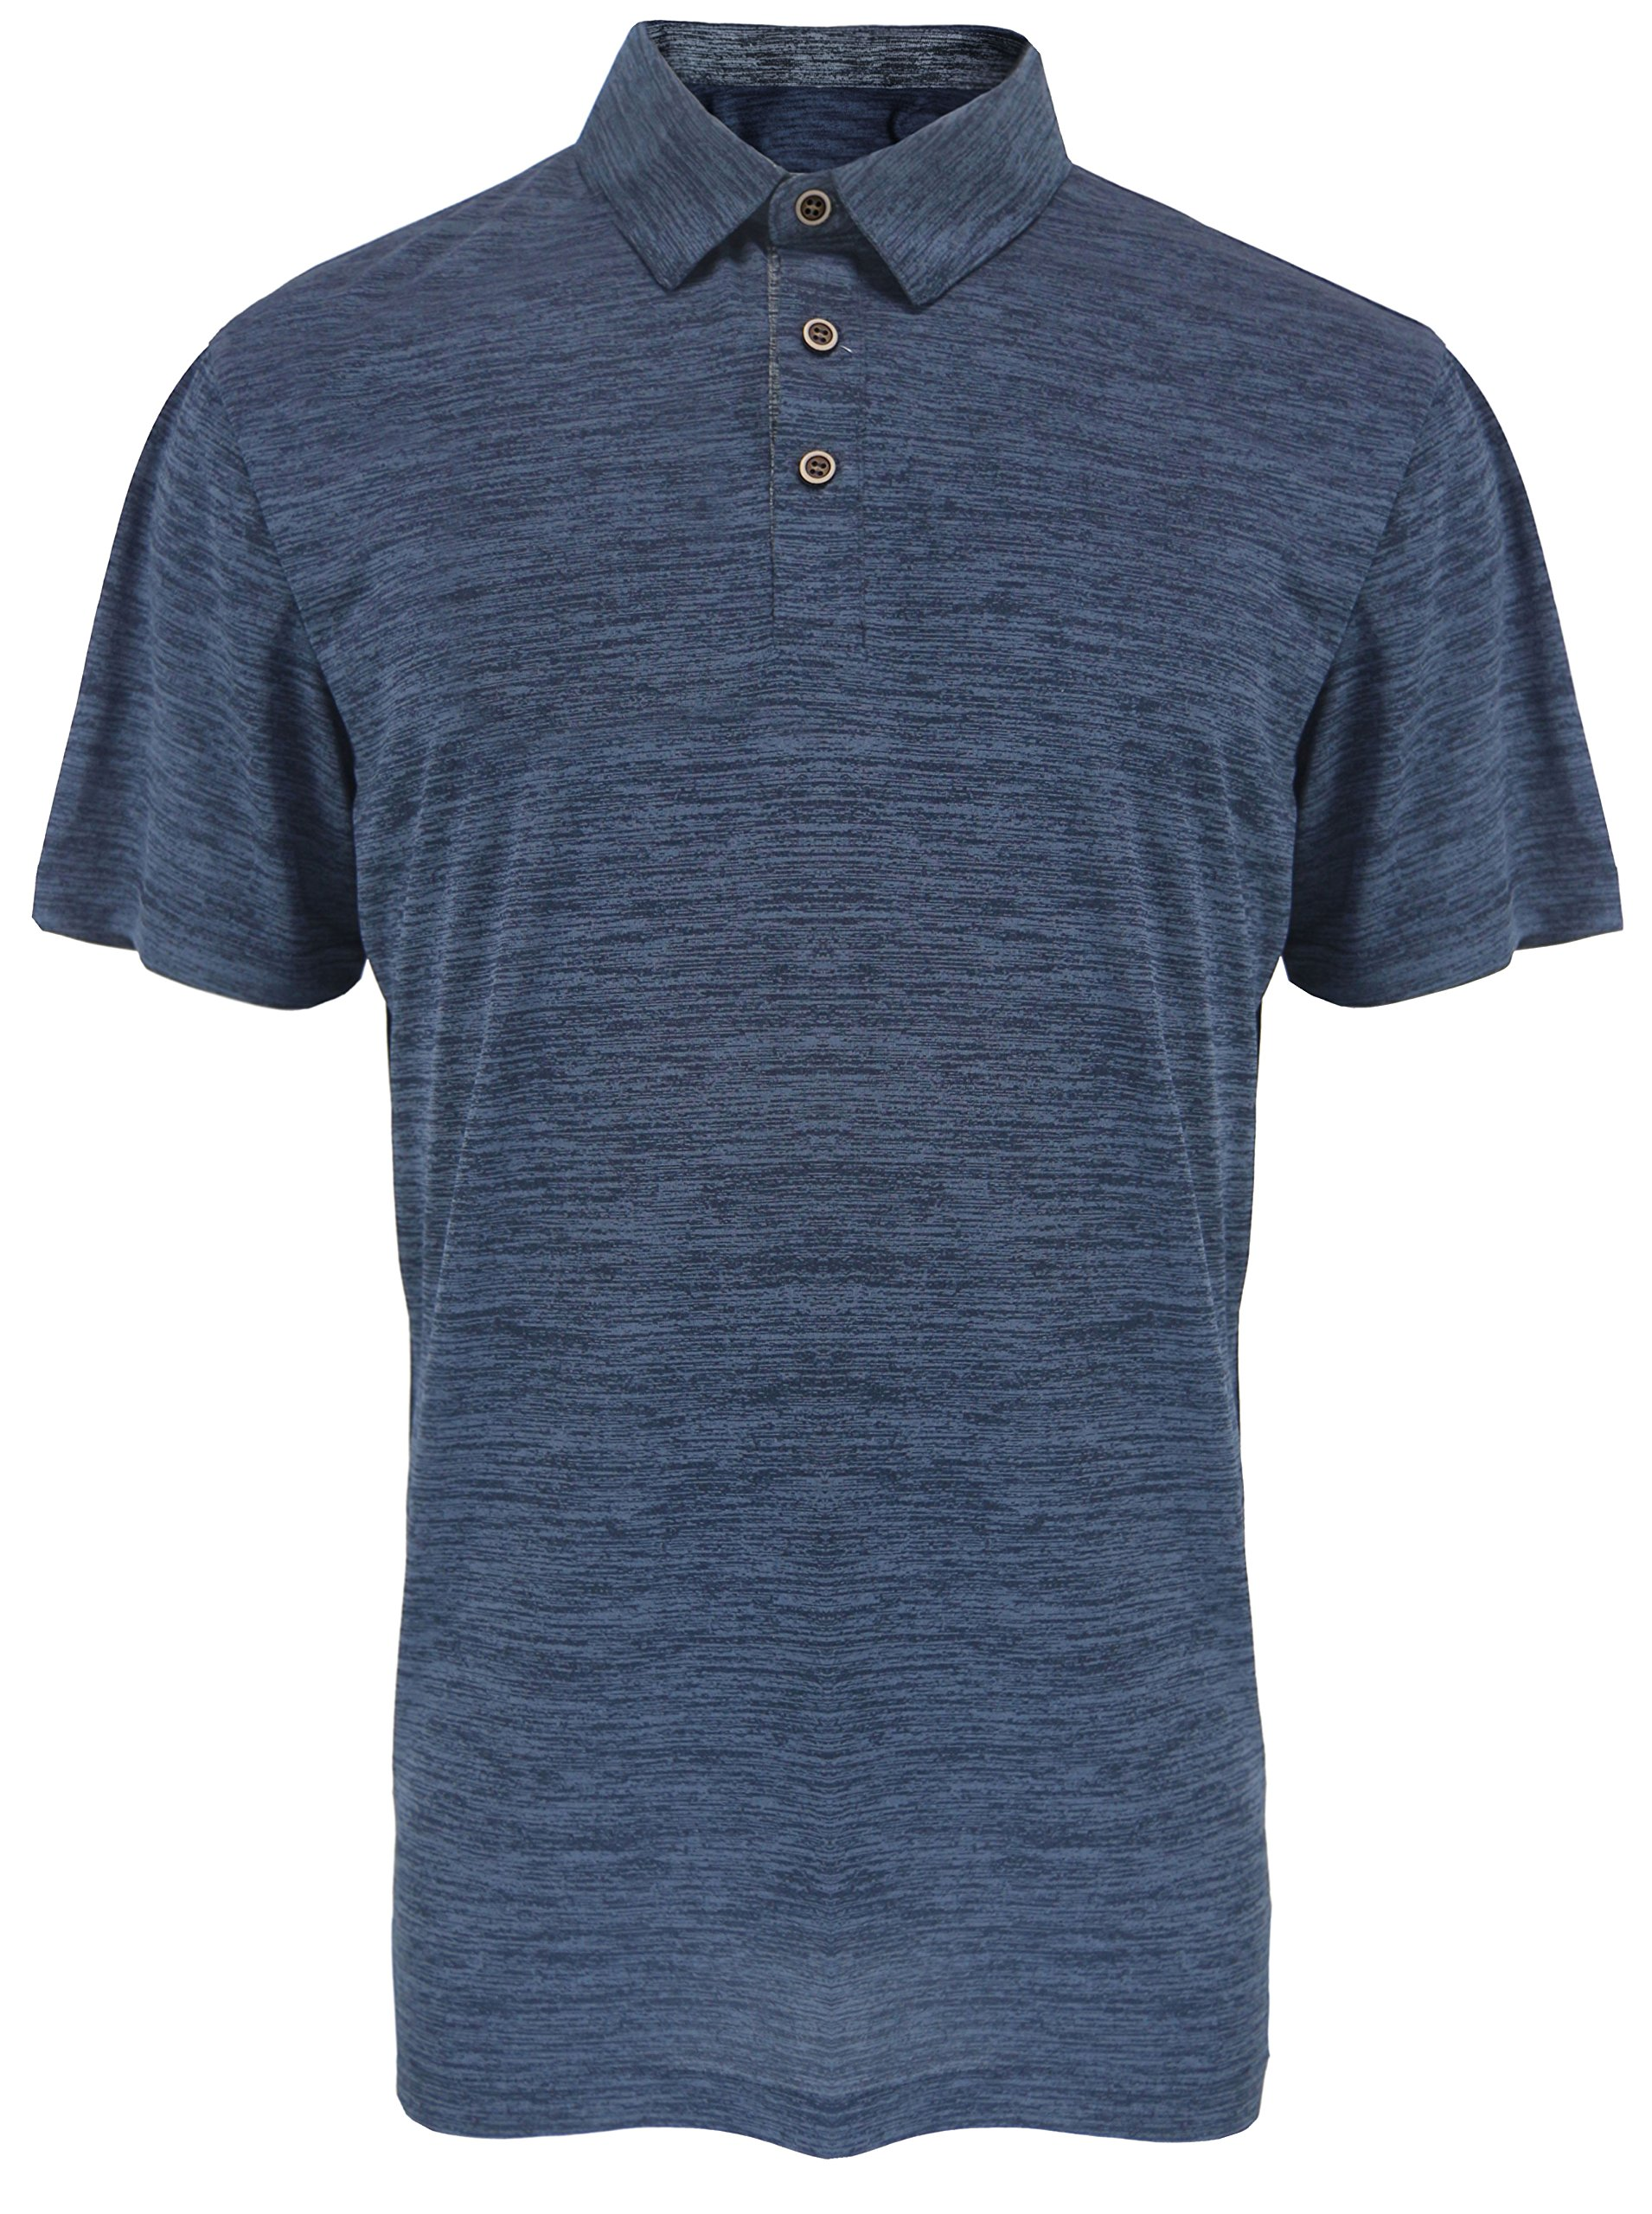 Leehanton Men's Active Moisture-Wicking Sport Tech Marble Performance Polo Shirt (2X-Large, Navy)